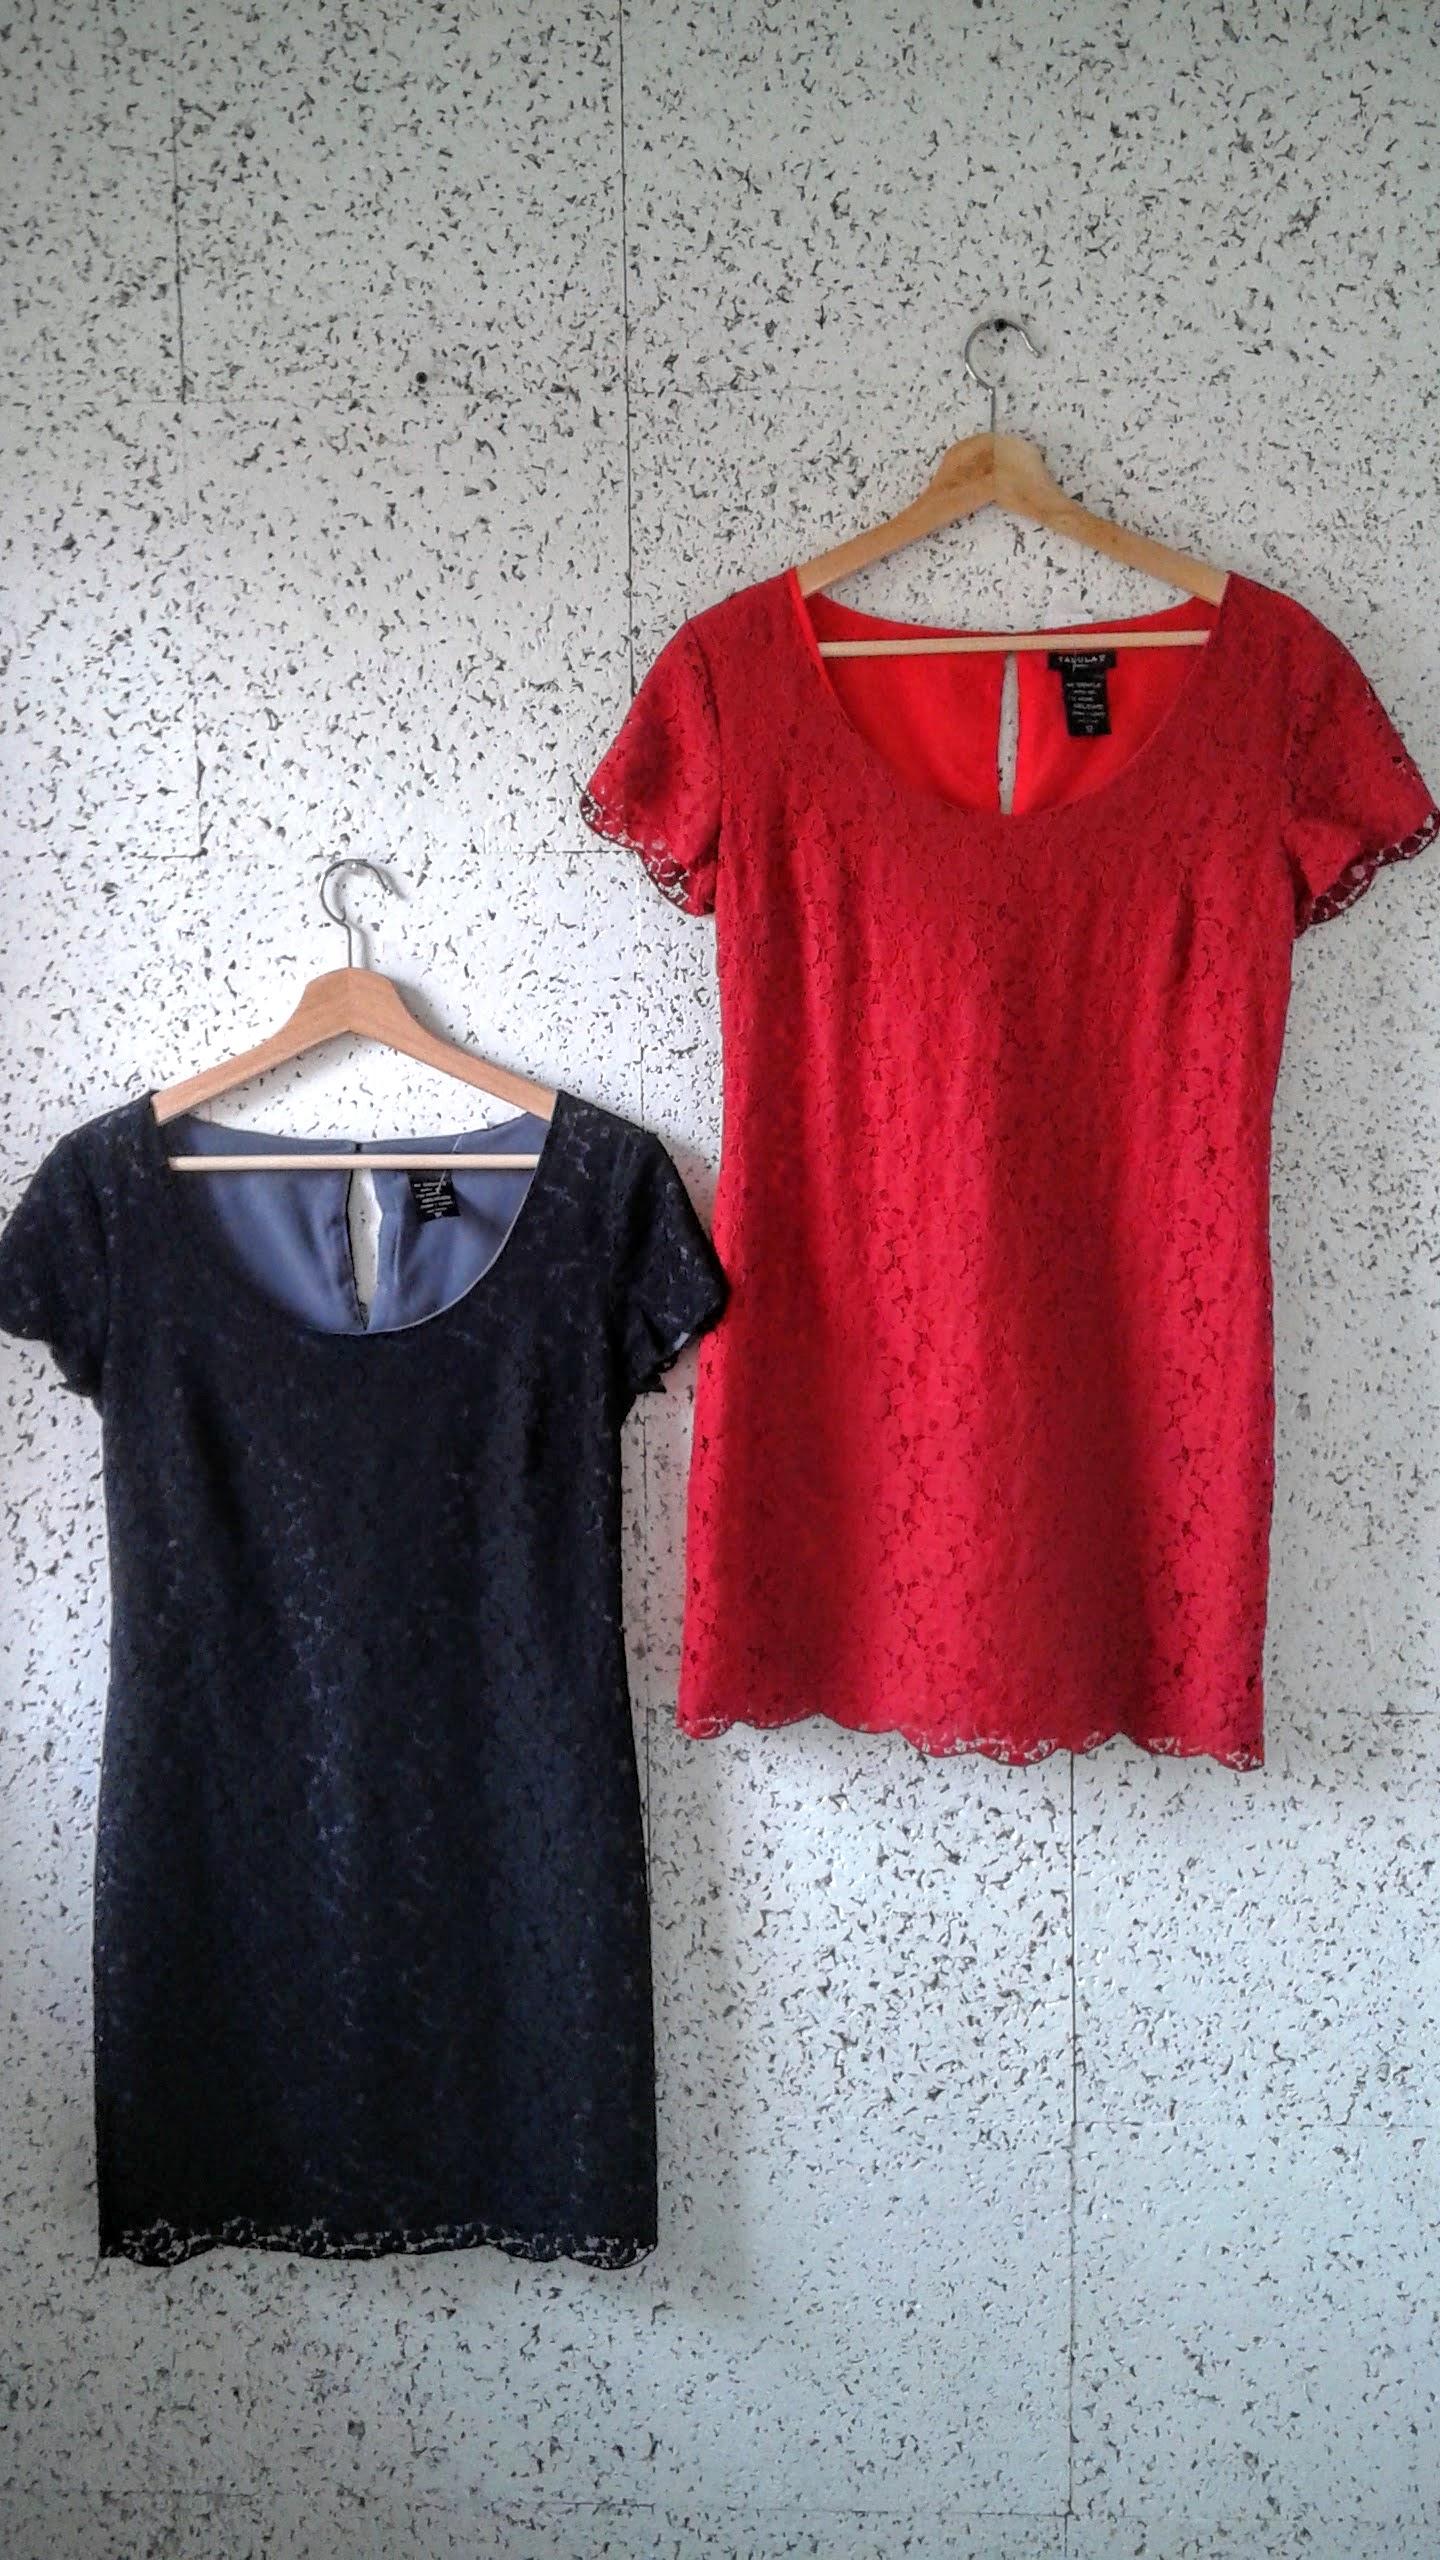 Tallulau dresses, $34 each; Black size XS, Red size S